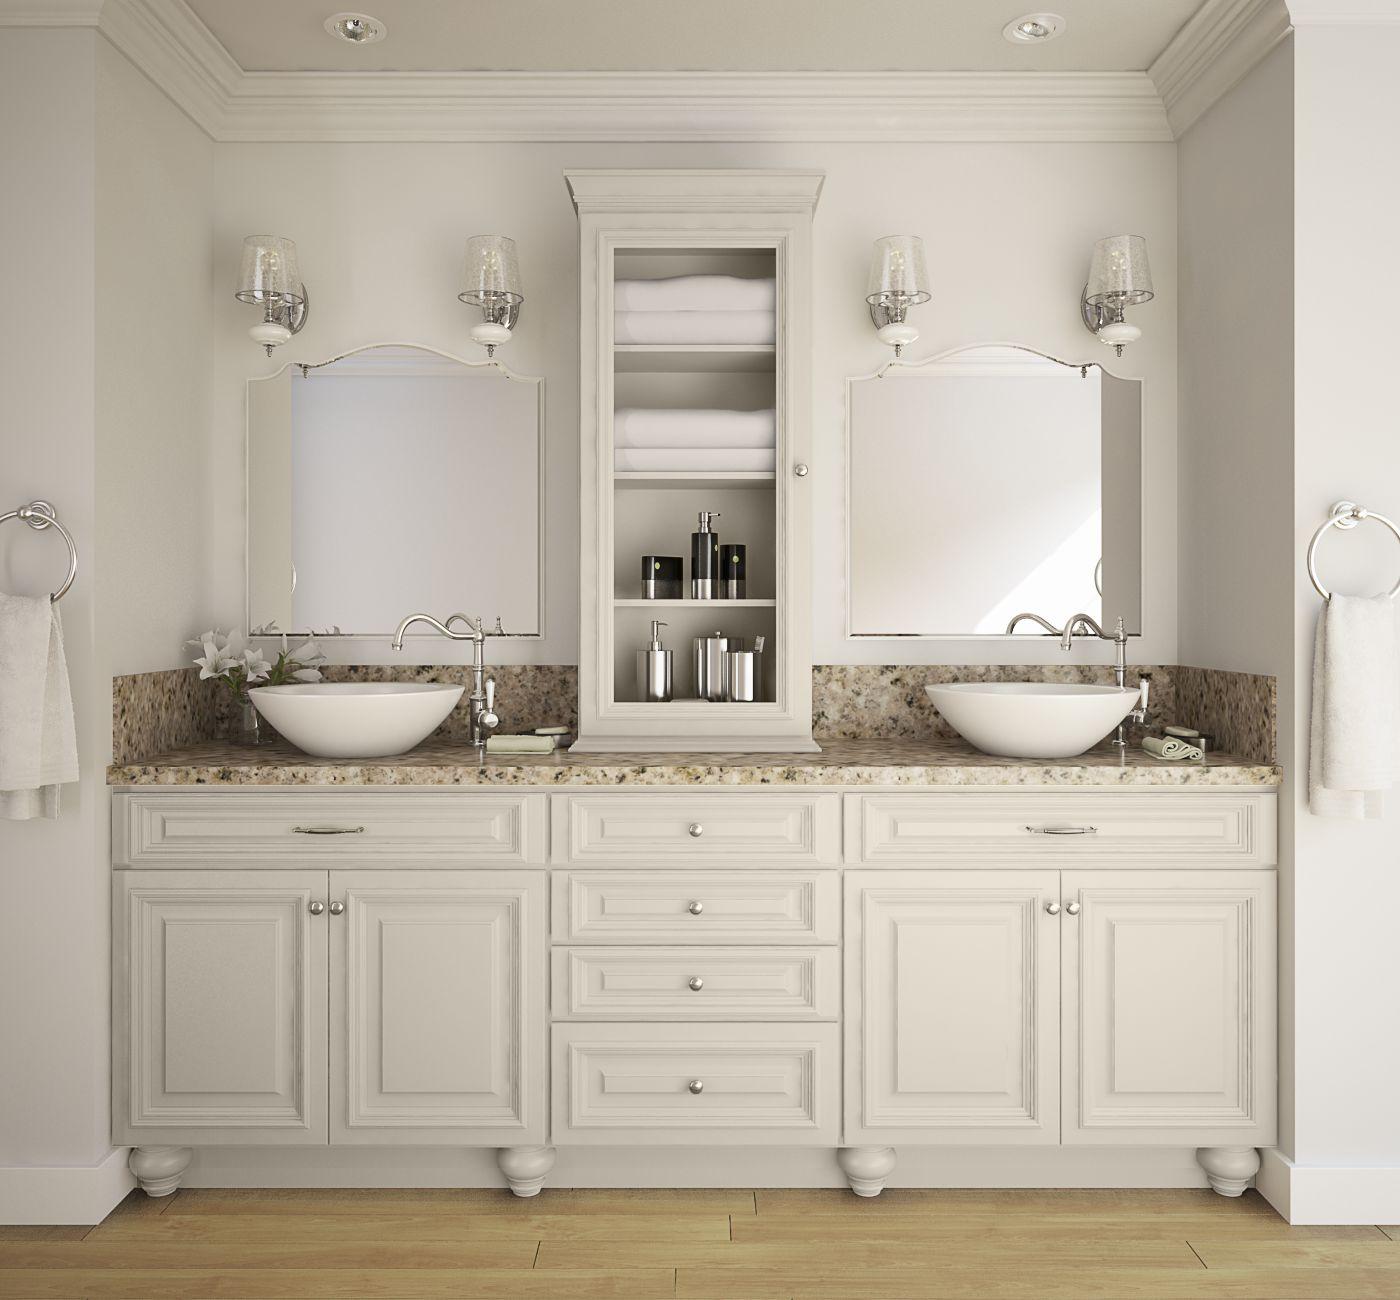 Already Assembled Kitchen Cabinets: Roosevelt Canvas Pre-Assembled Kitchen Cabinets